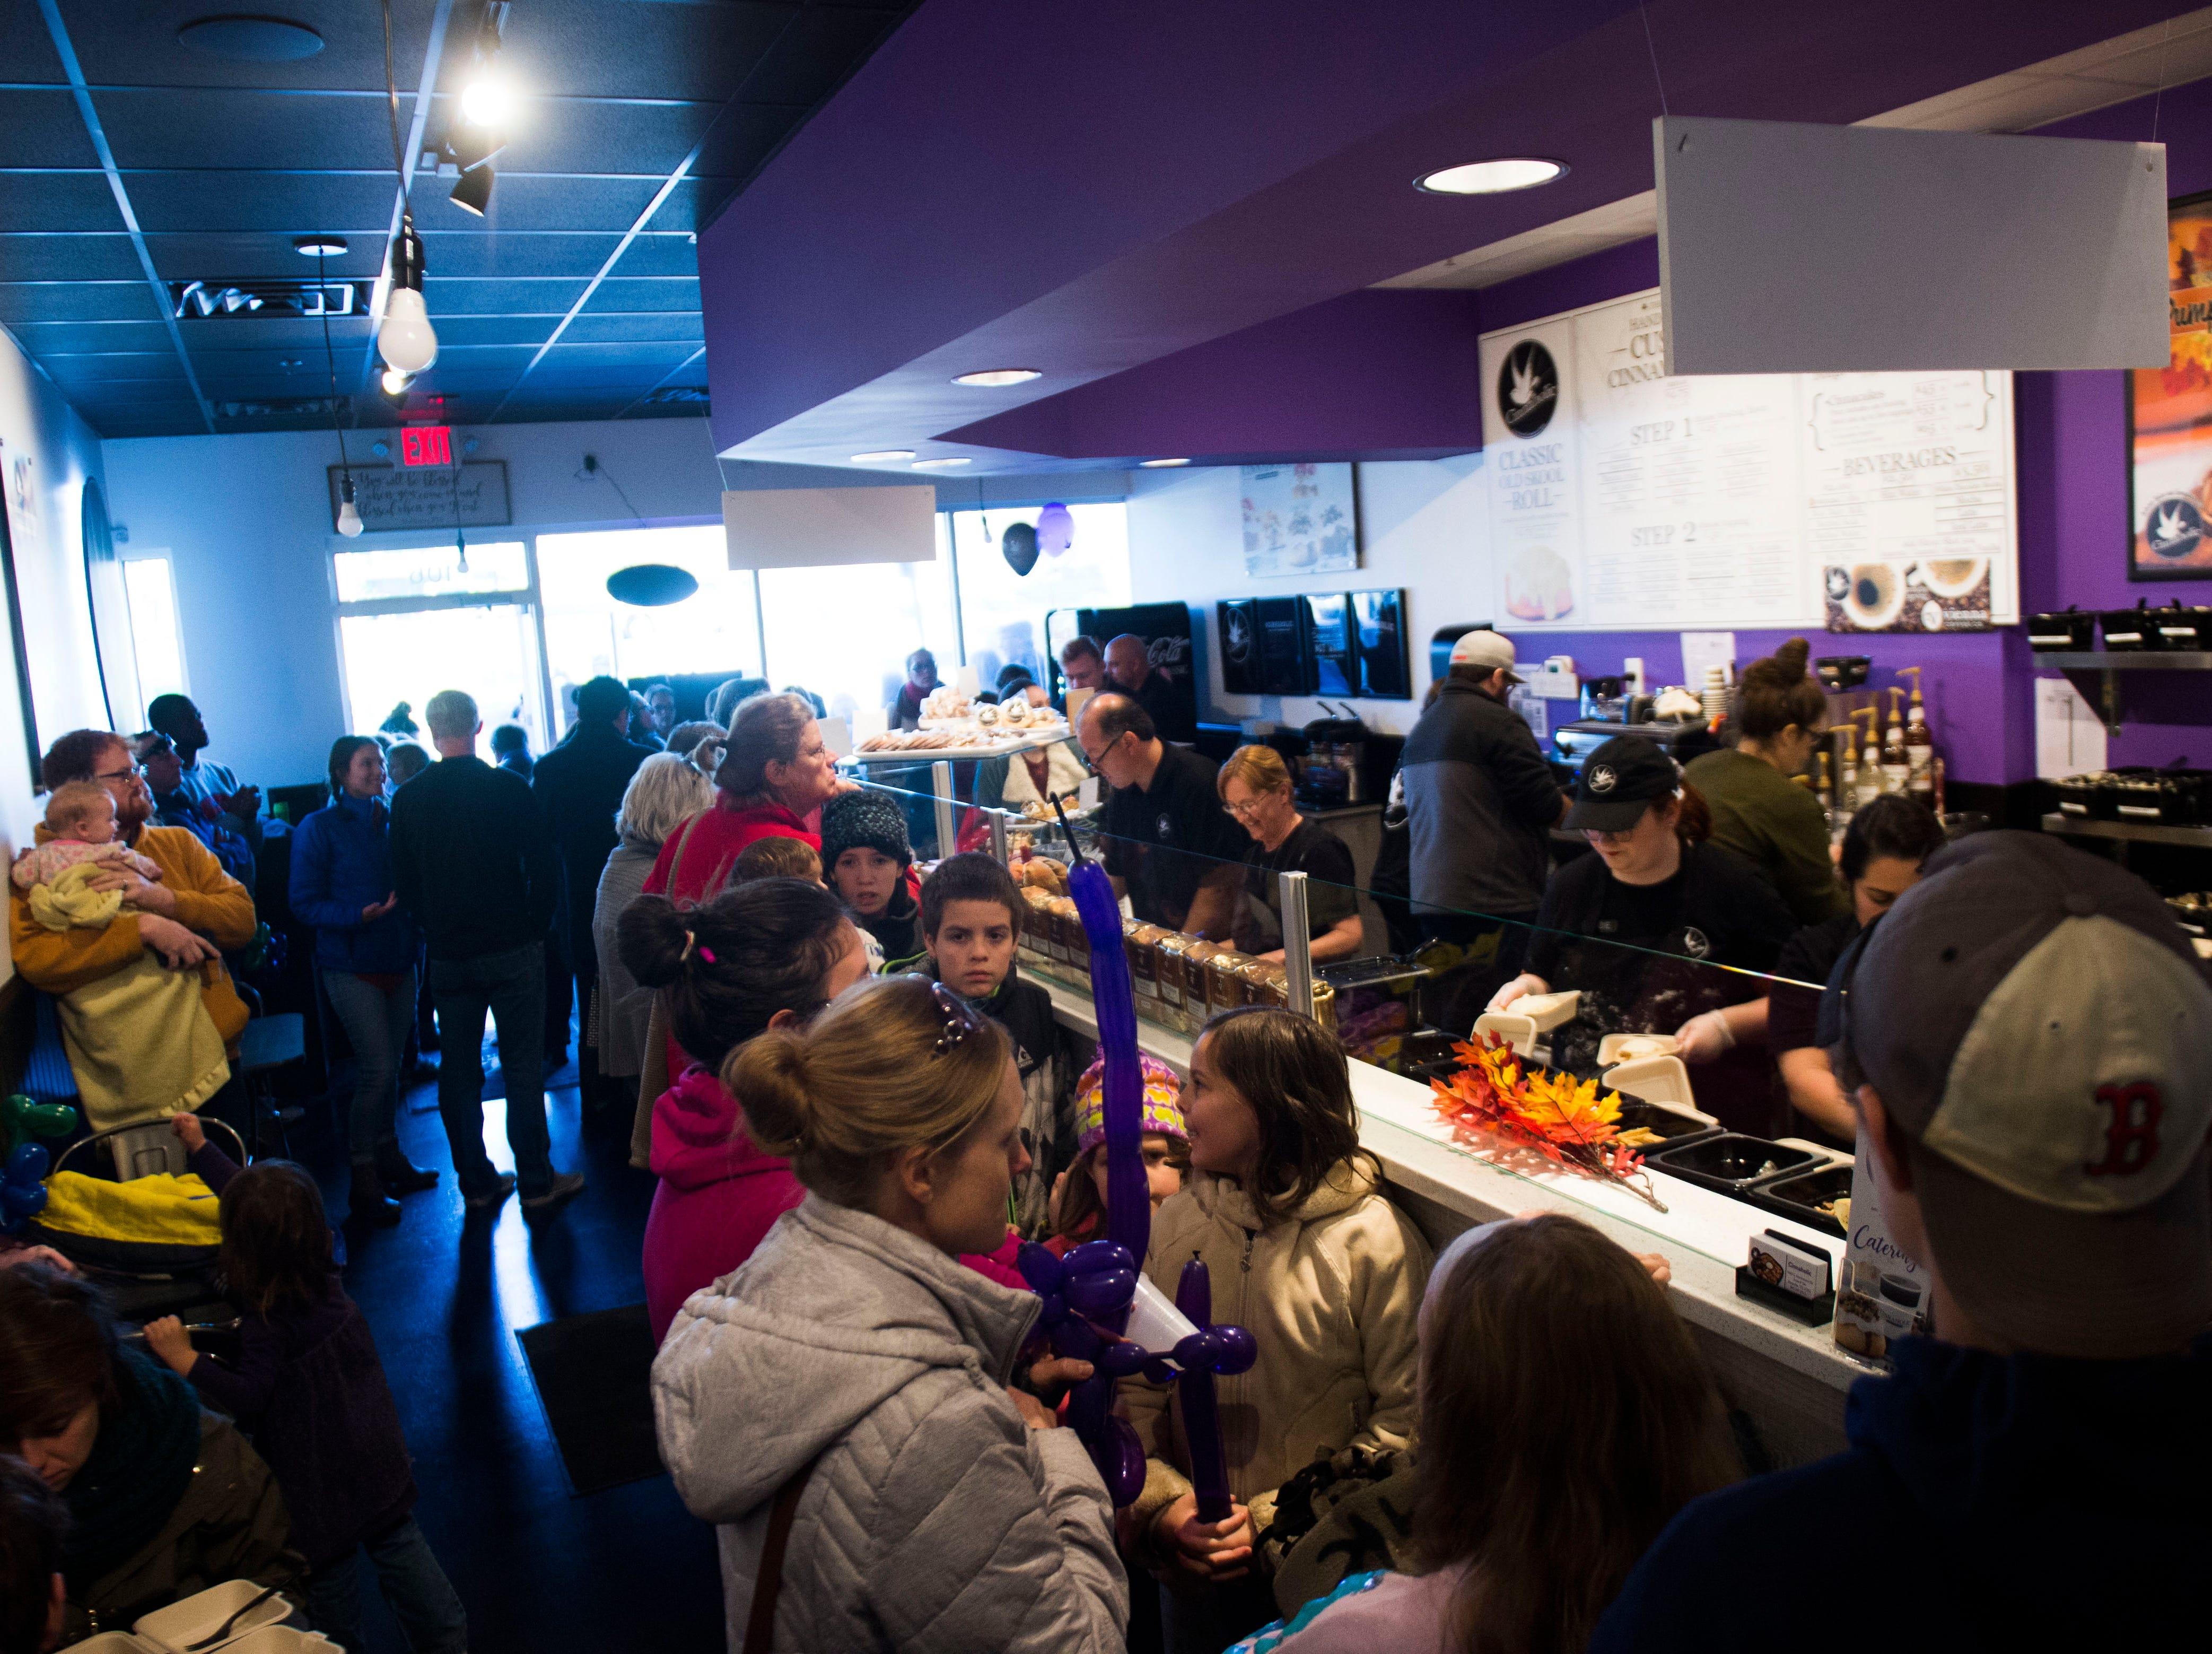 Patrons fill Cinnaholic at it's grand opening at 9450 S. Northshore Drive Friday, Nov. 16, 2018. Cinnaholic is a vegan bake shop.